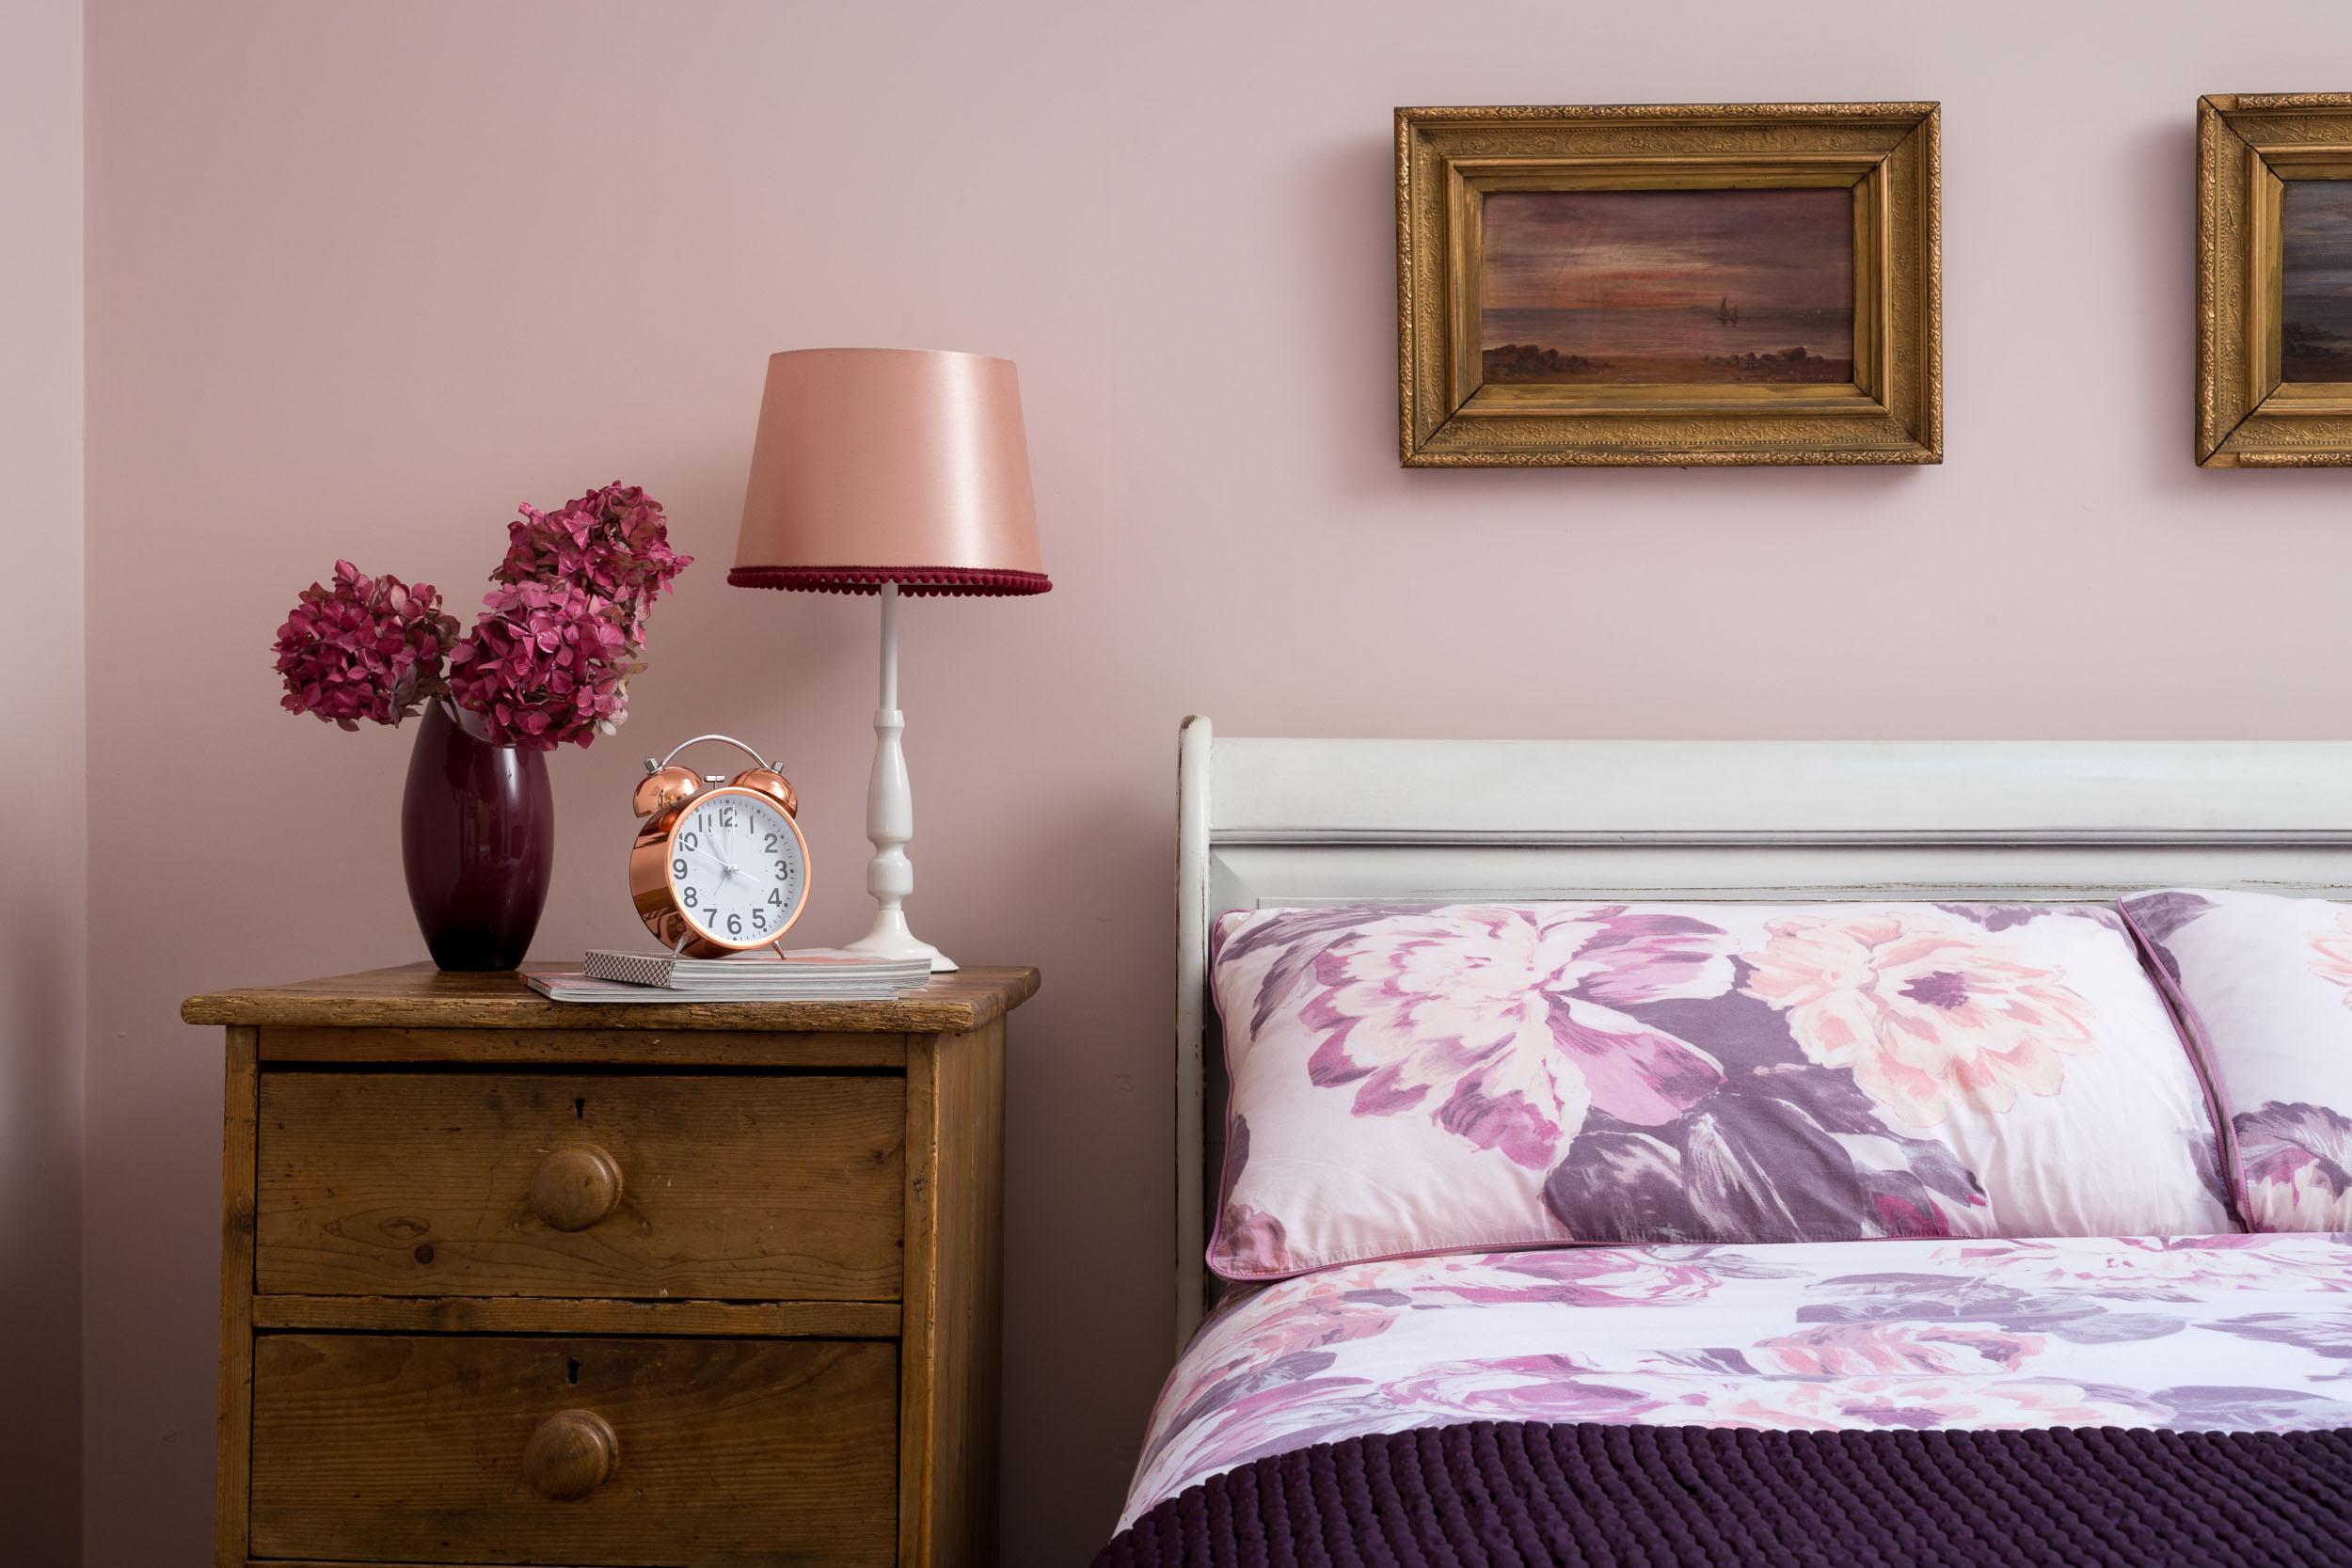 interior design bedroom detail pink purple rustic leeds.jpg